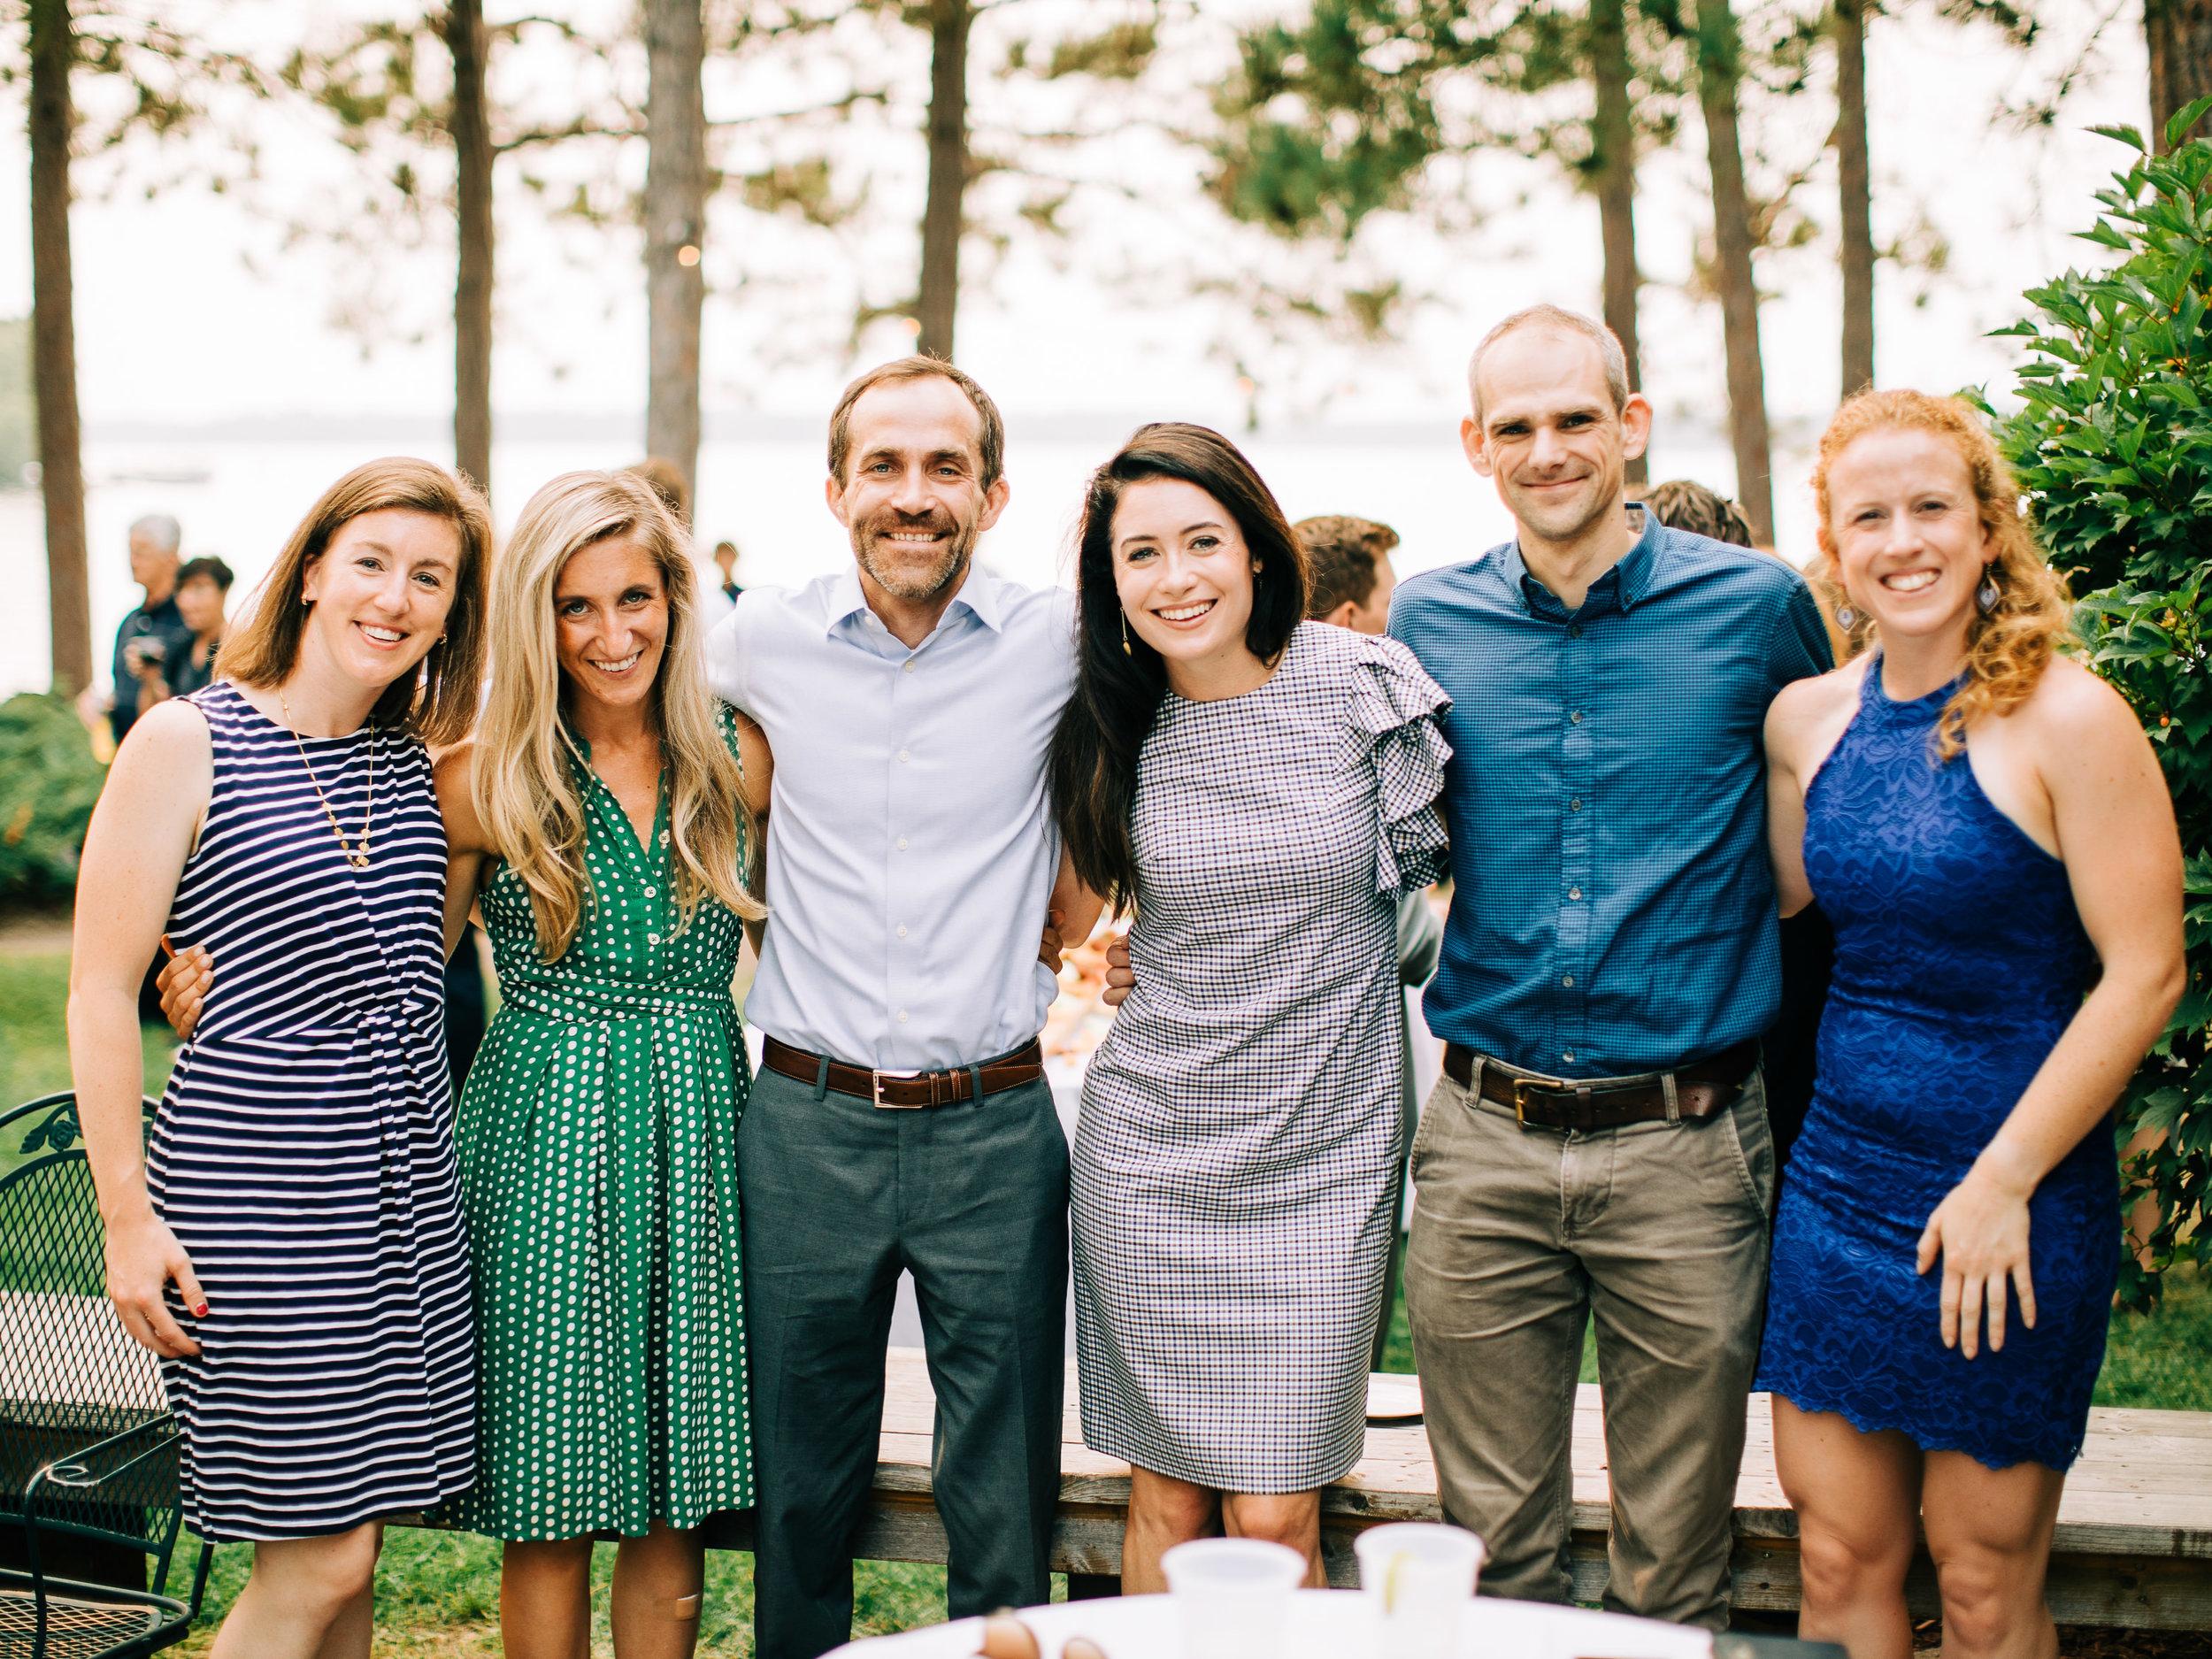 Lakeside Patio Wedding at Manhattan Beach Lodge in Crosslake, MN